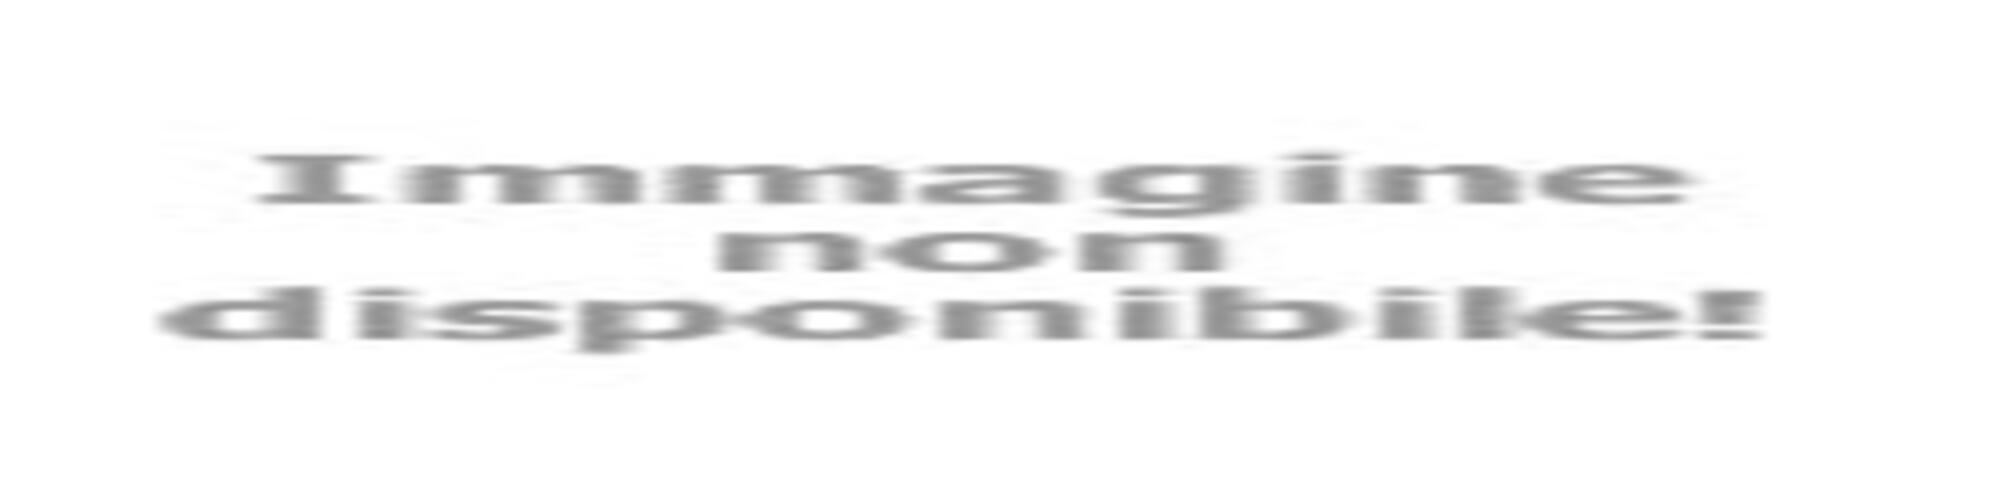 Offerta YU-GI-HO Championship a Rimini